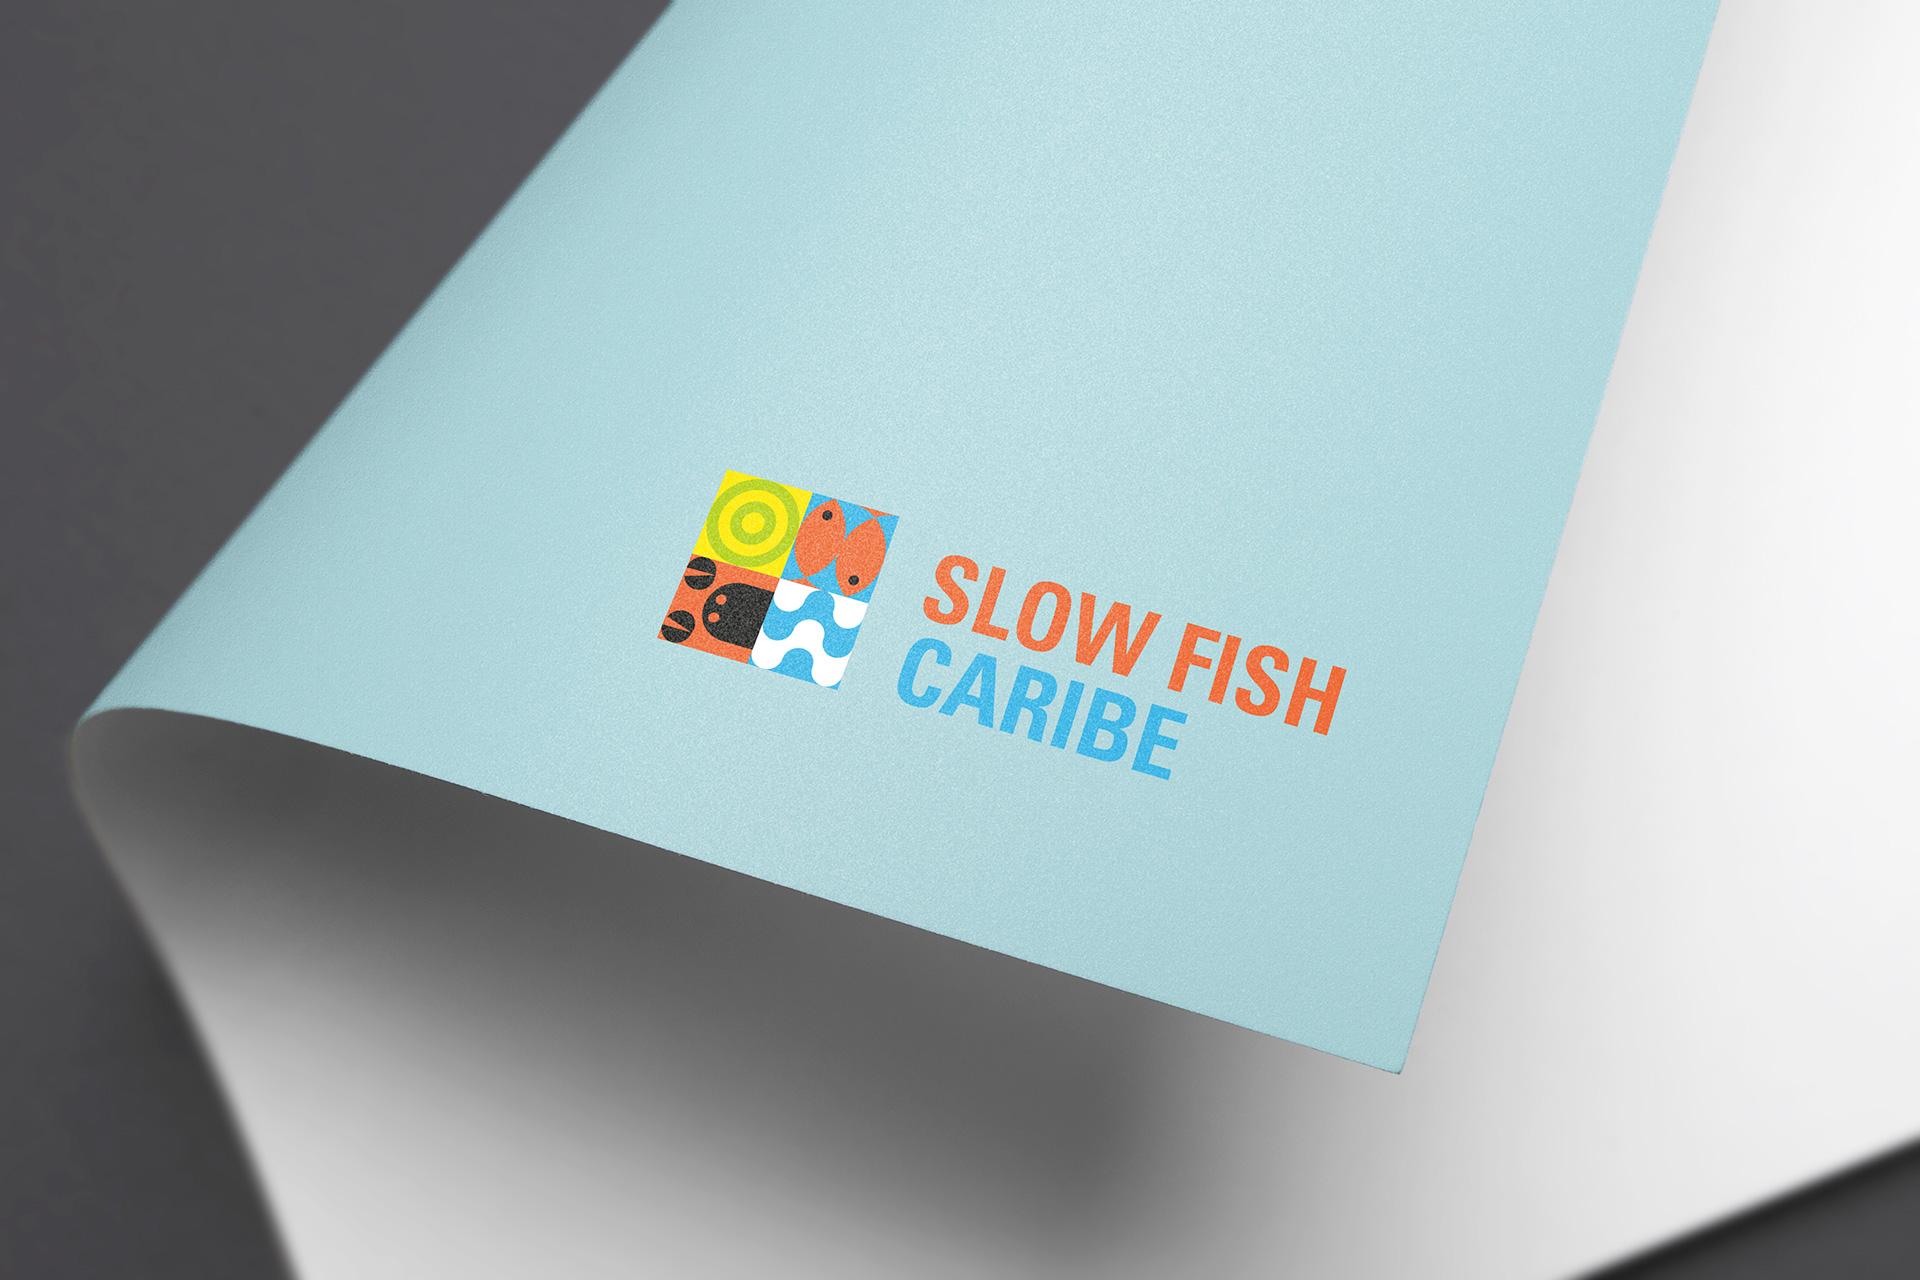 Slow Fish Caribe / Slow Food